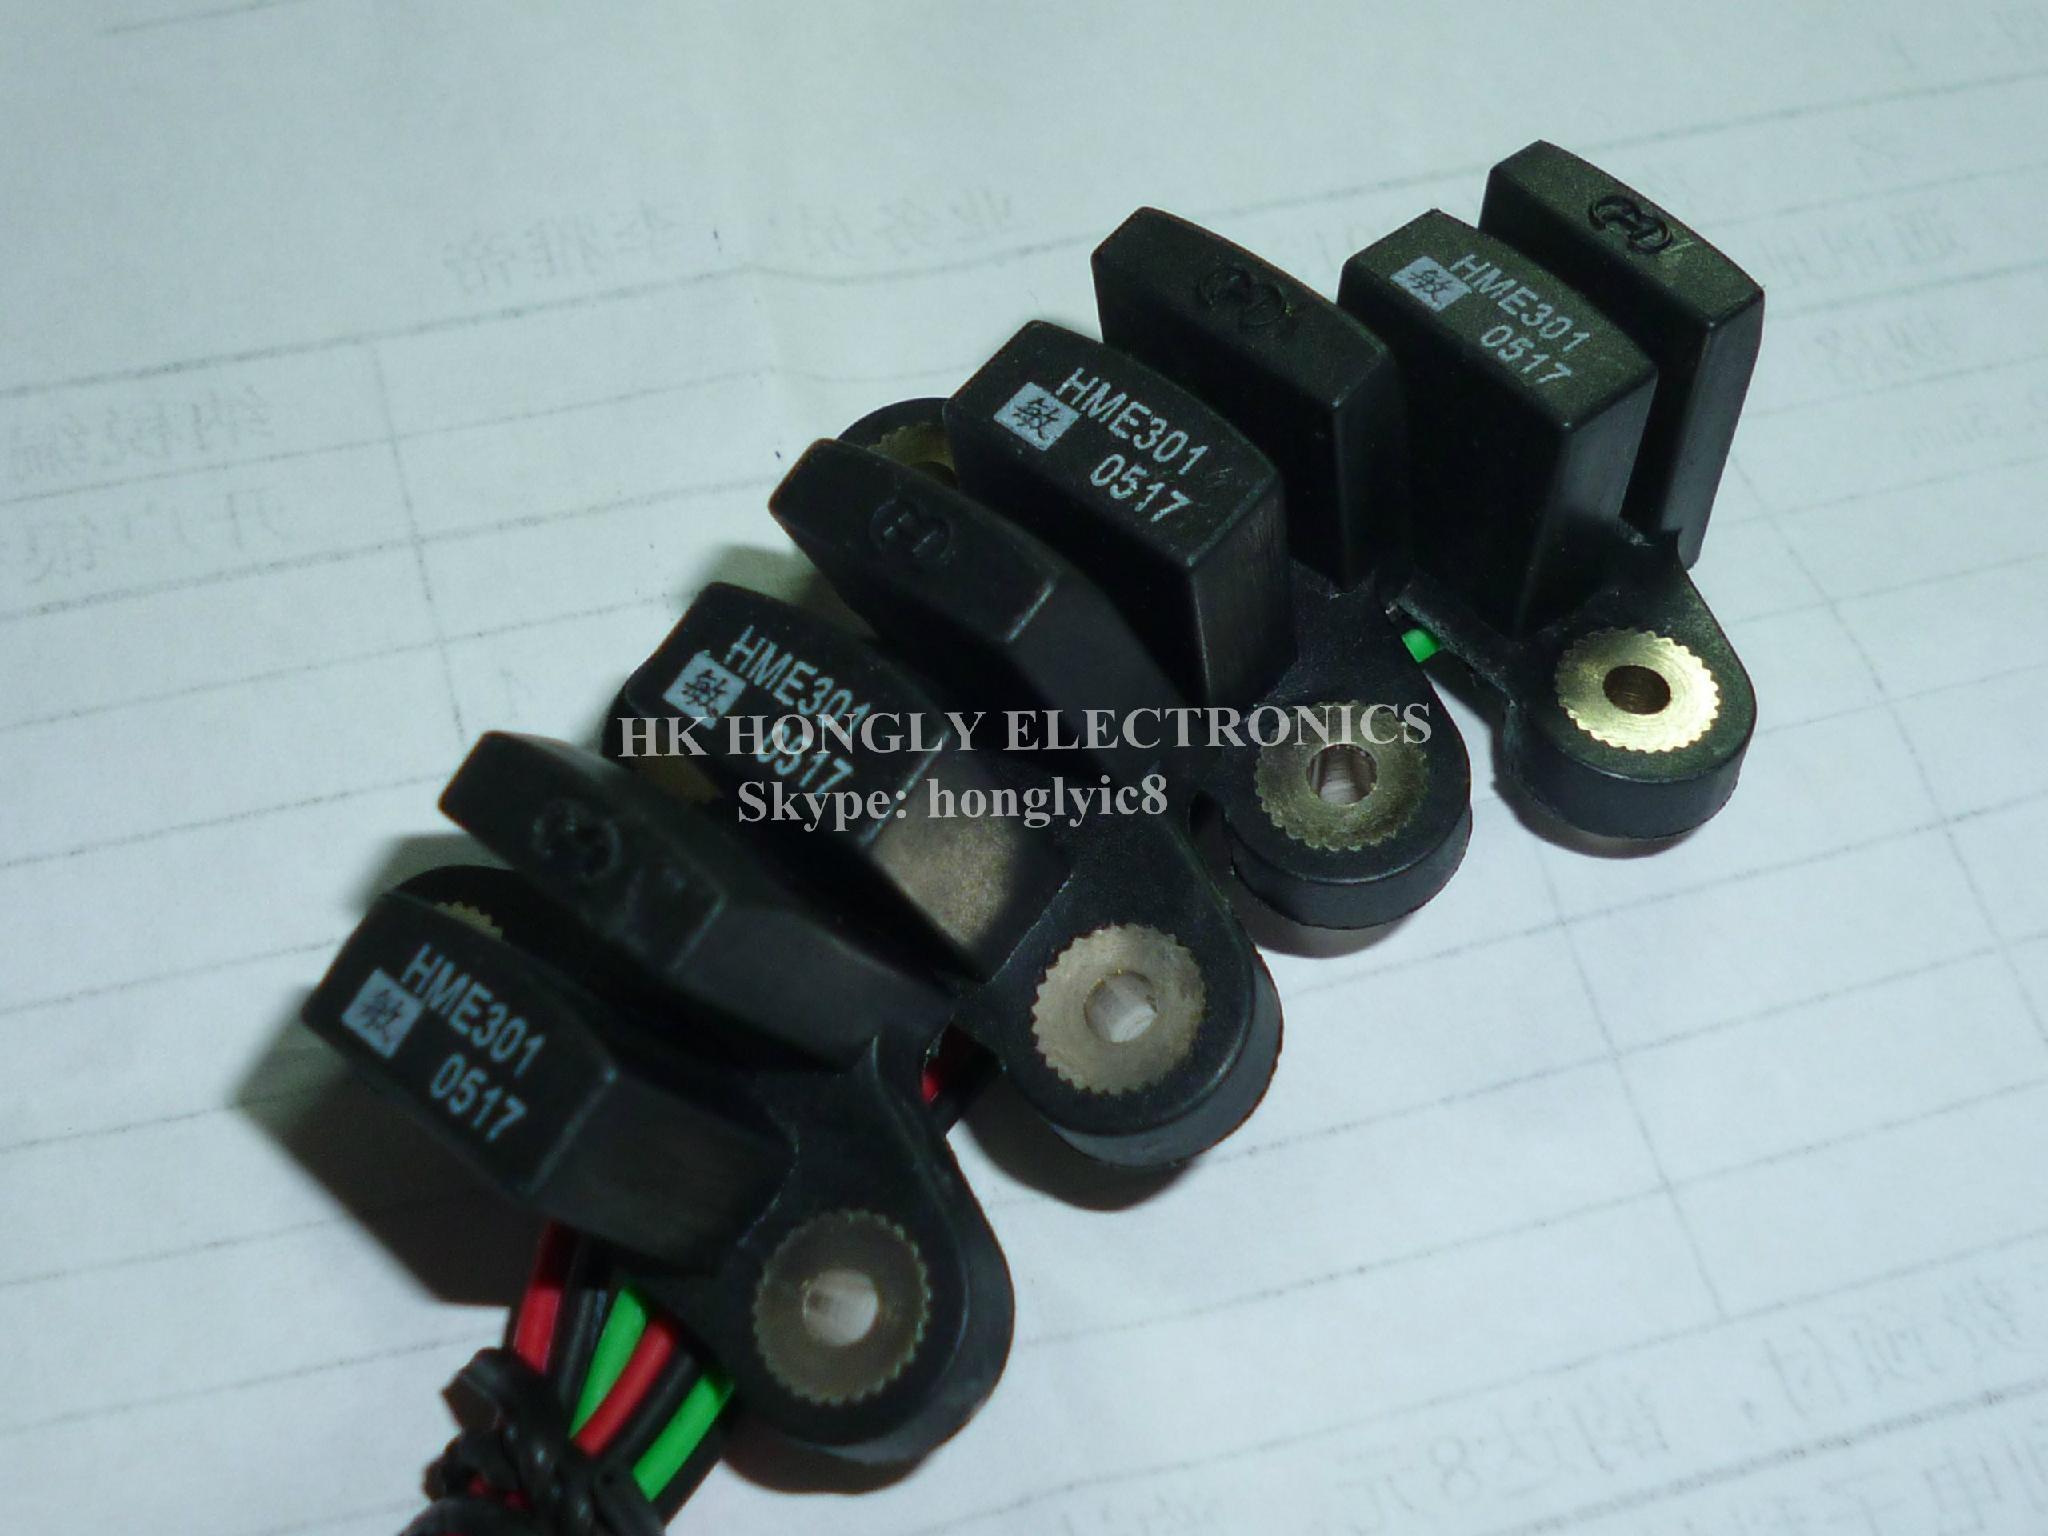 Hall Effect Vane Sensors HME301 (China Trading Company